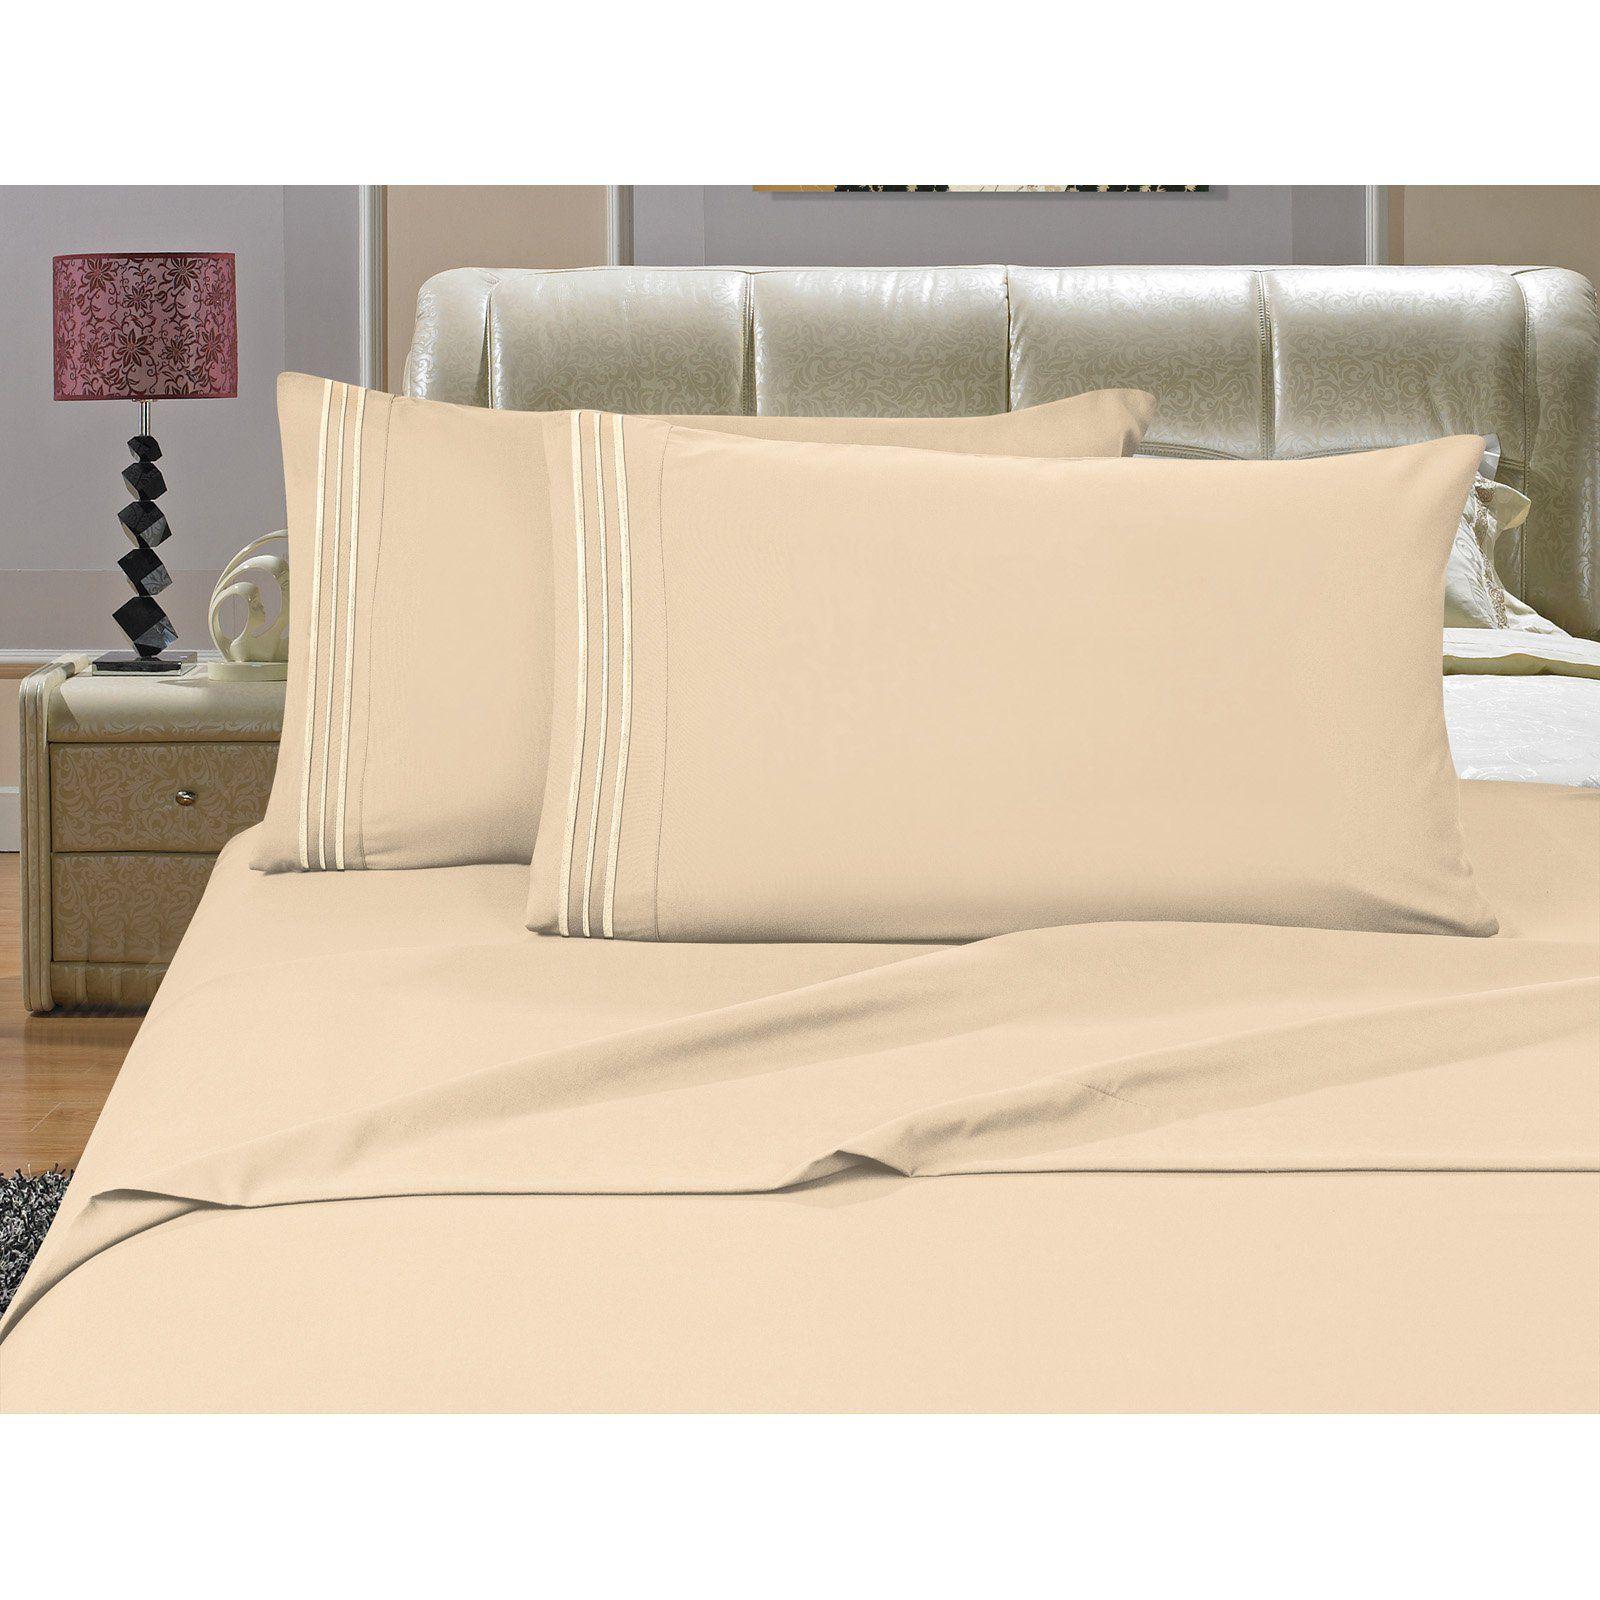 1500 Thread Count Deep Pocket Sheet Set by Elegant Comfort